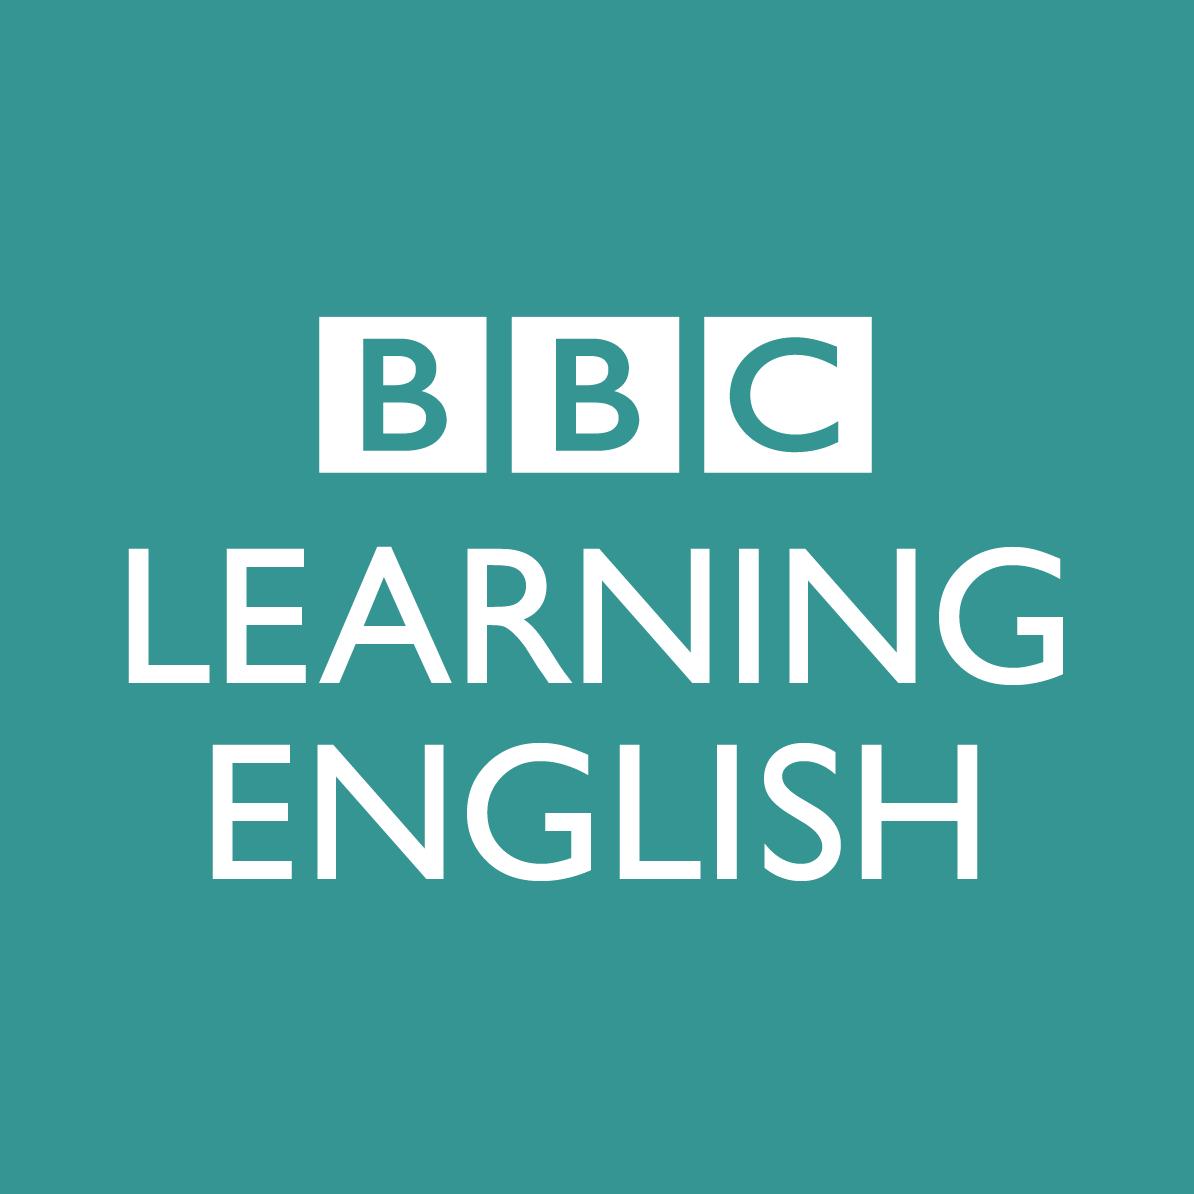 inglés gratis bbc